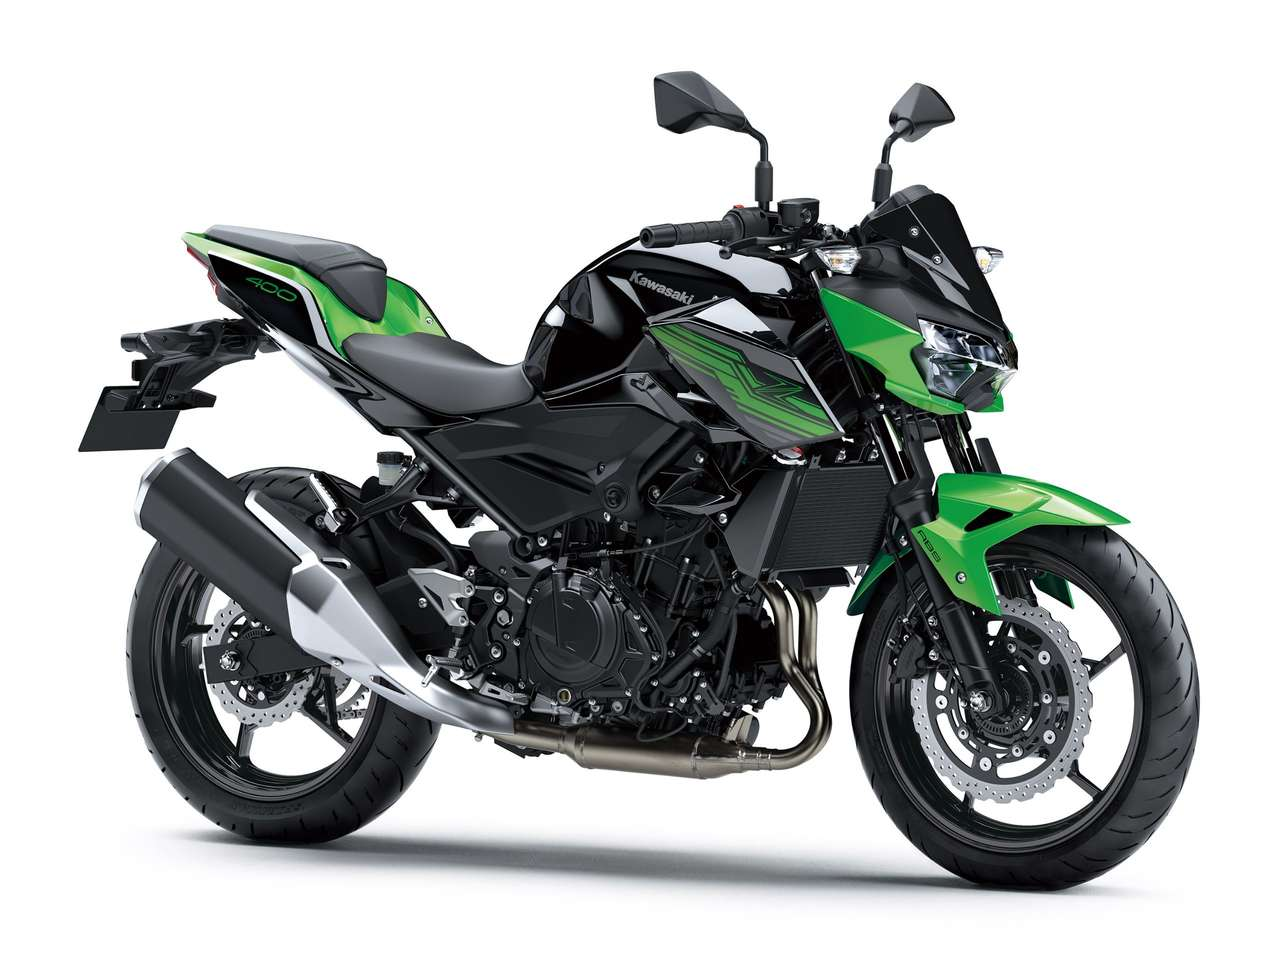 Z400 2020: Metallic Spark Black/Candy Lime Green